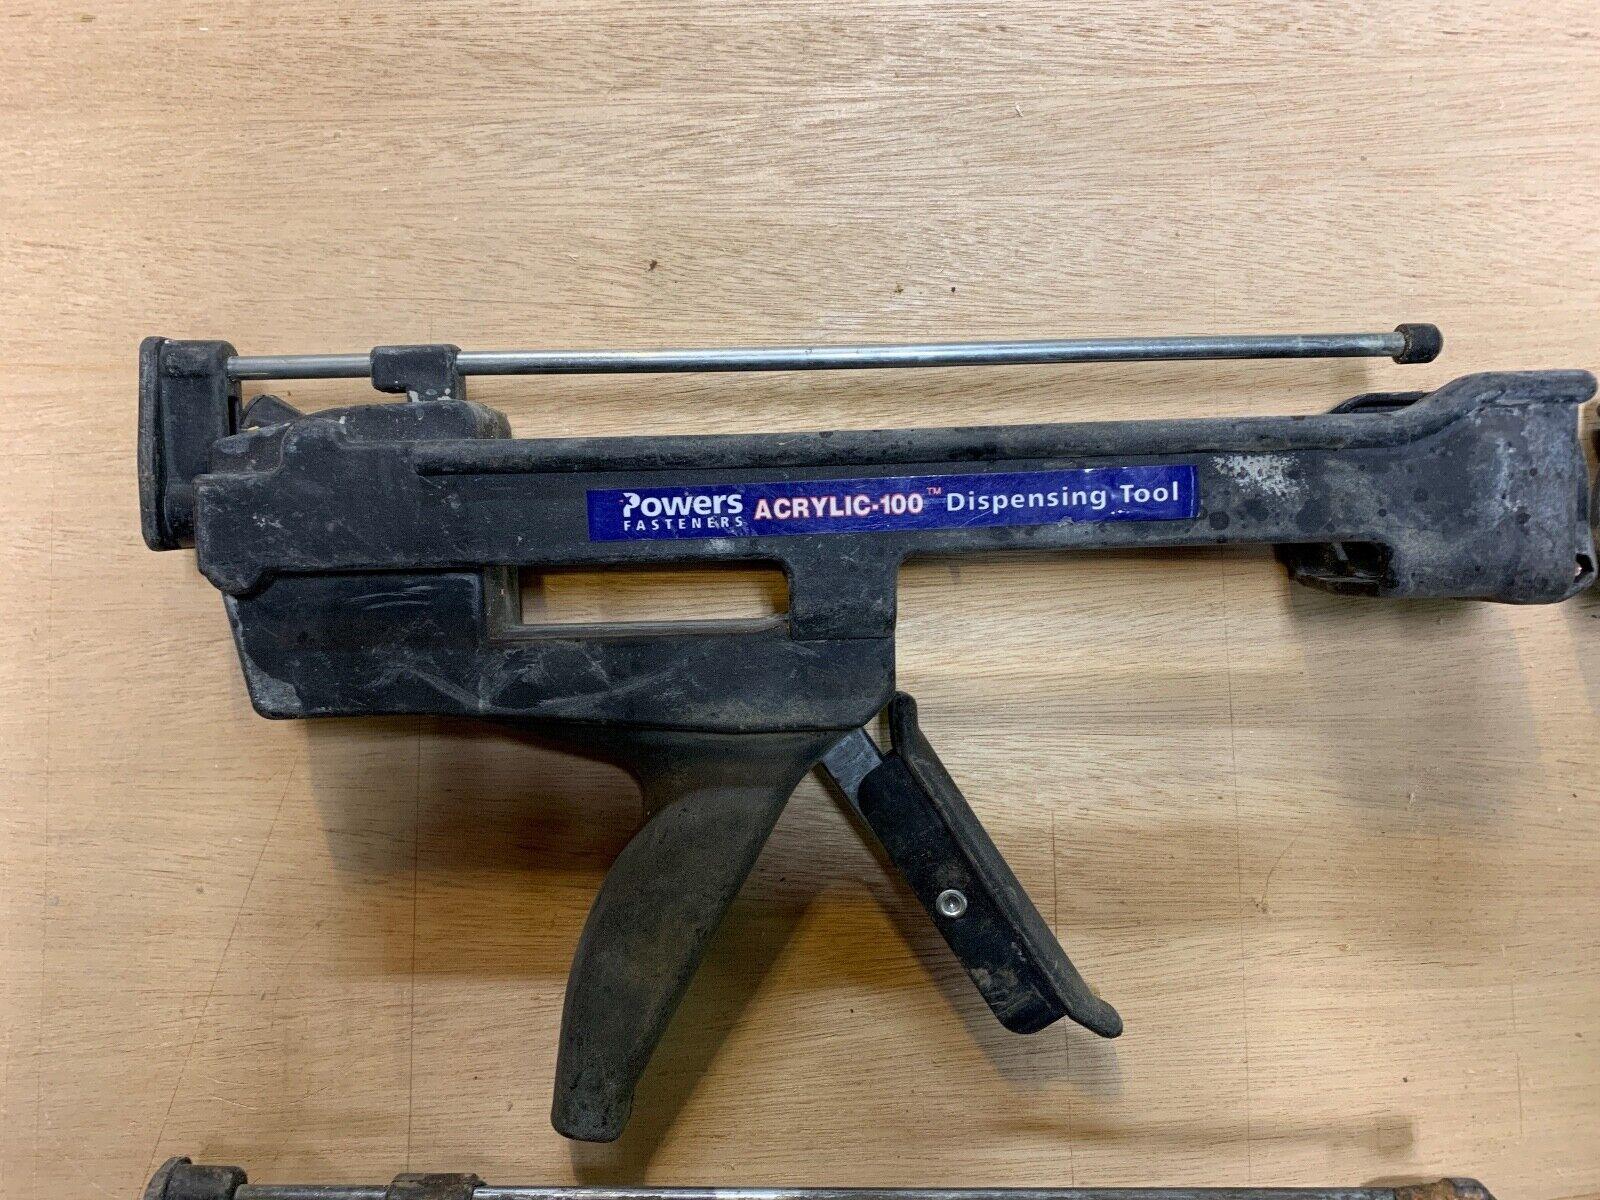 Powers Acrylic-100 Concrete Adhesive Dispensing Tool Caulk Gun